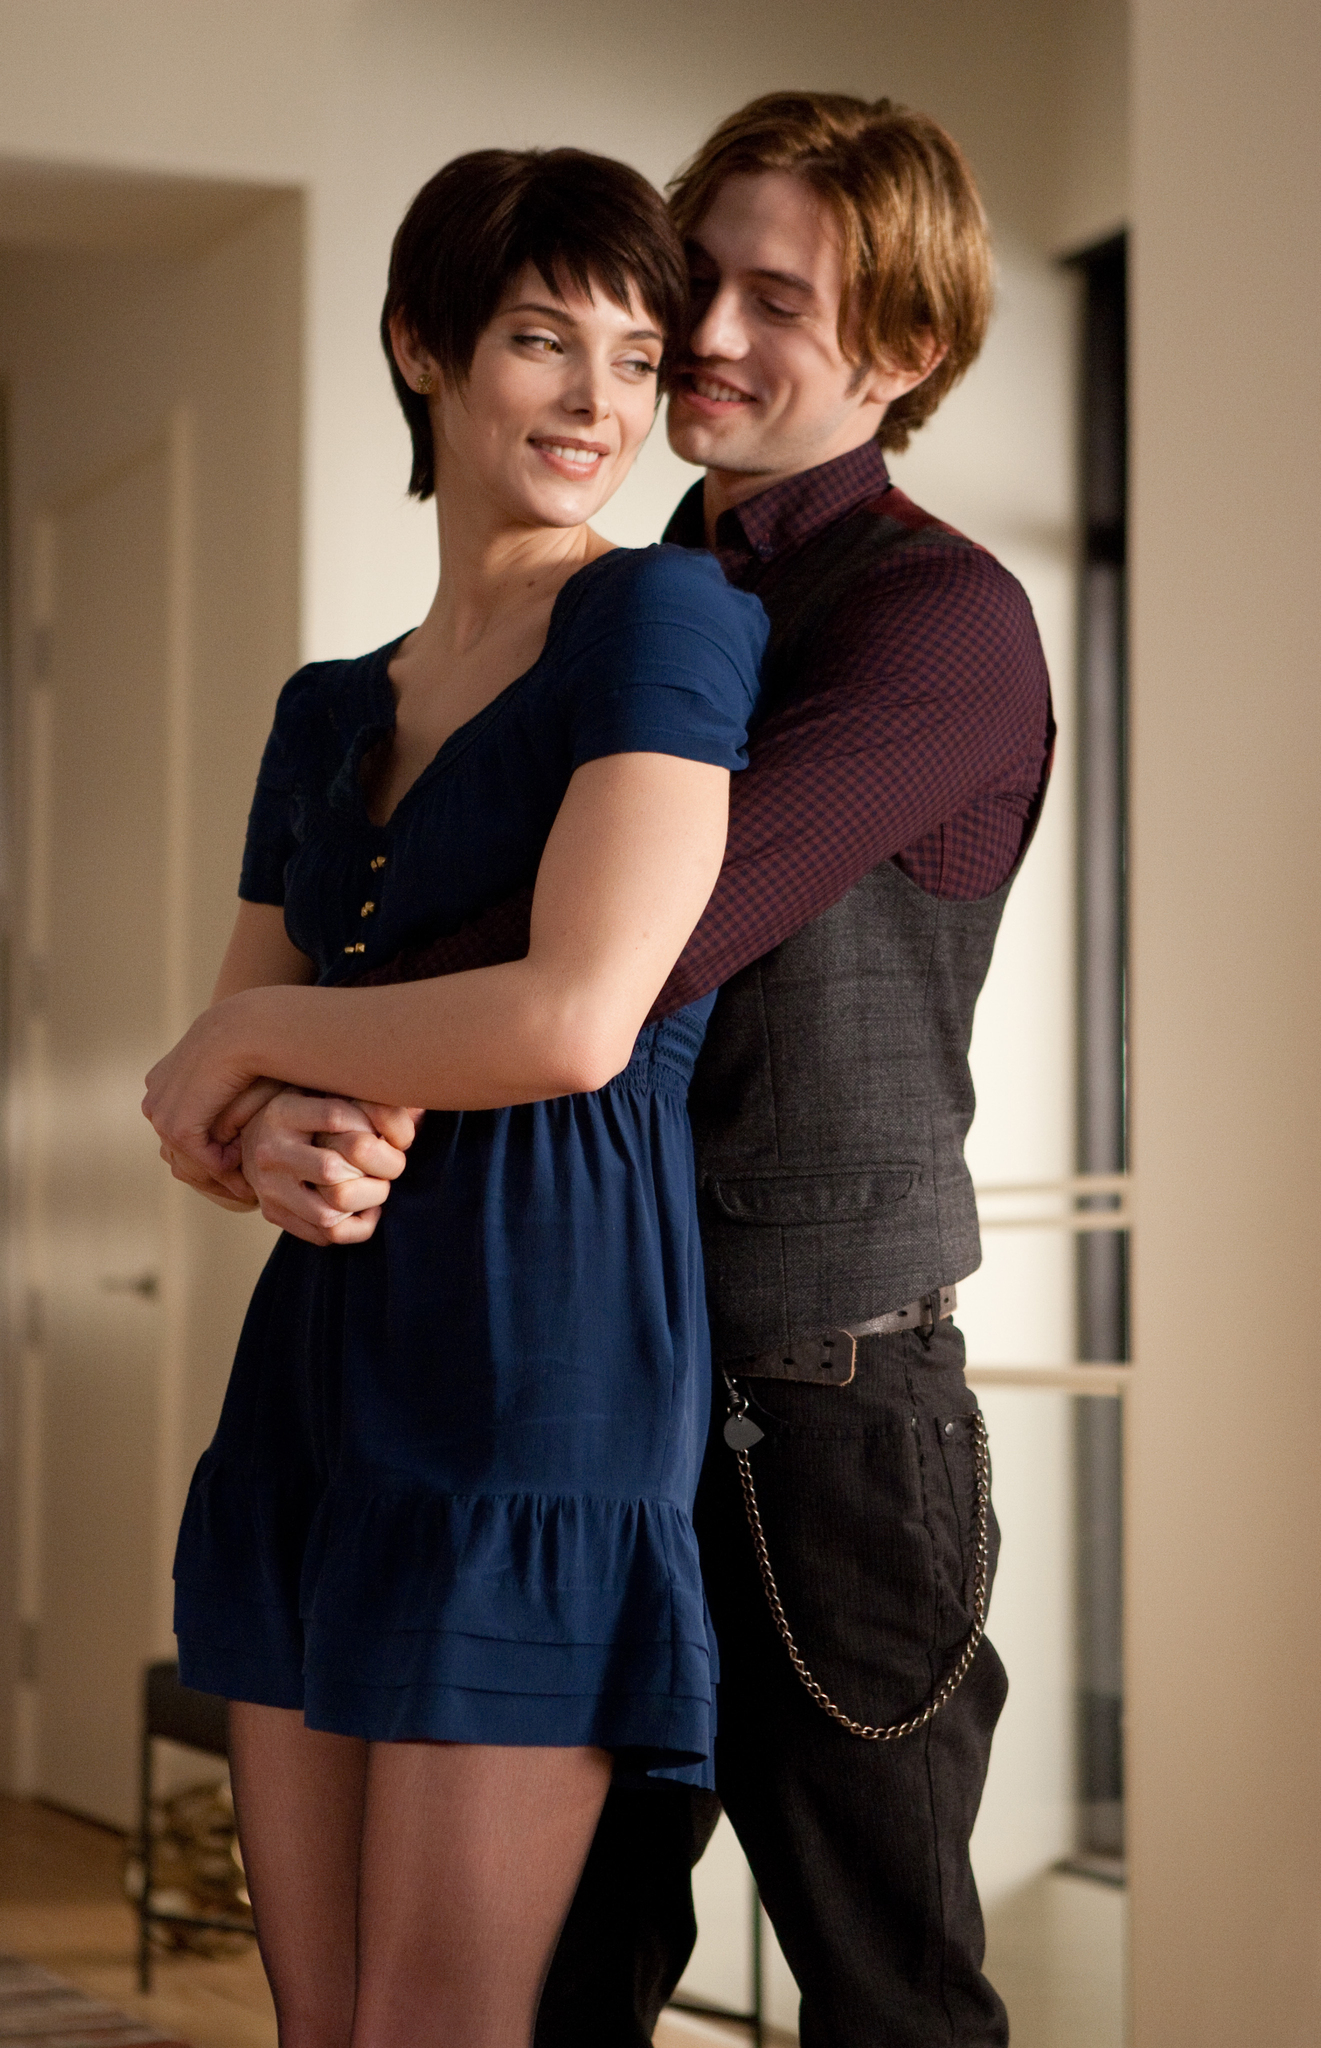 Still of Jackson Rathbone and Ashley Greene in Brekstanti ausra. 2 dalis (2012)